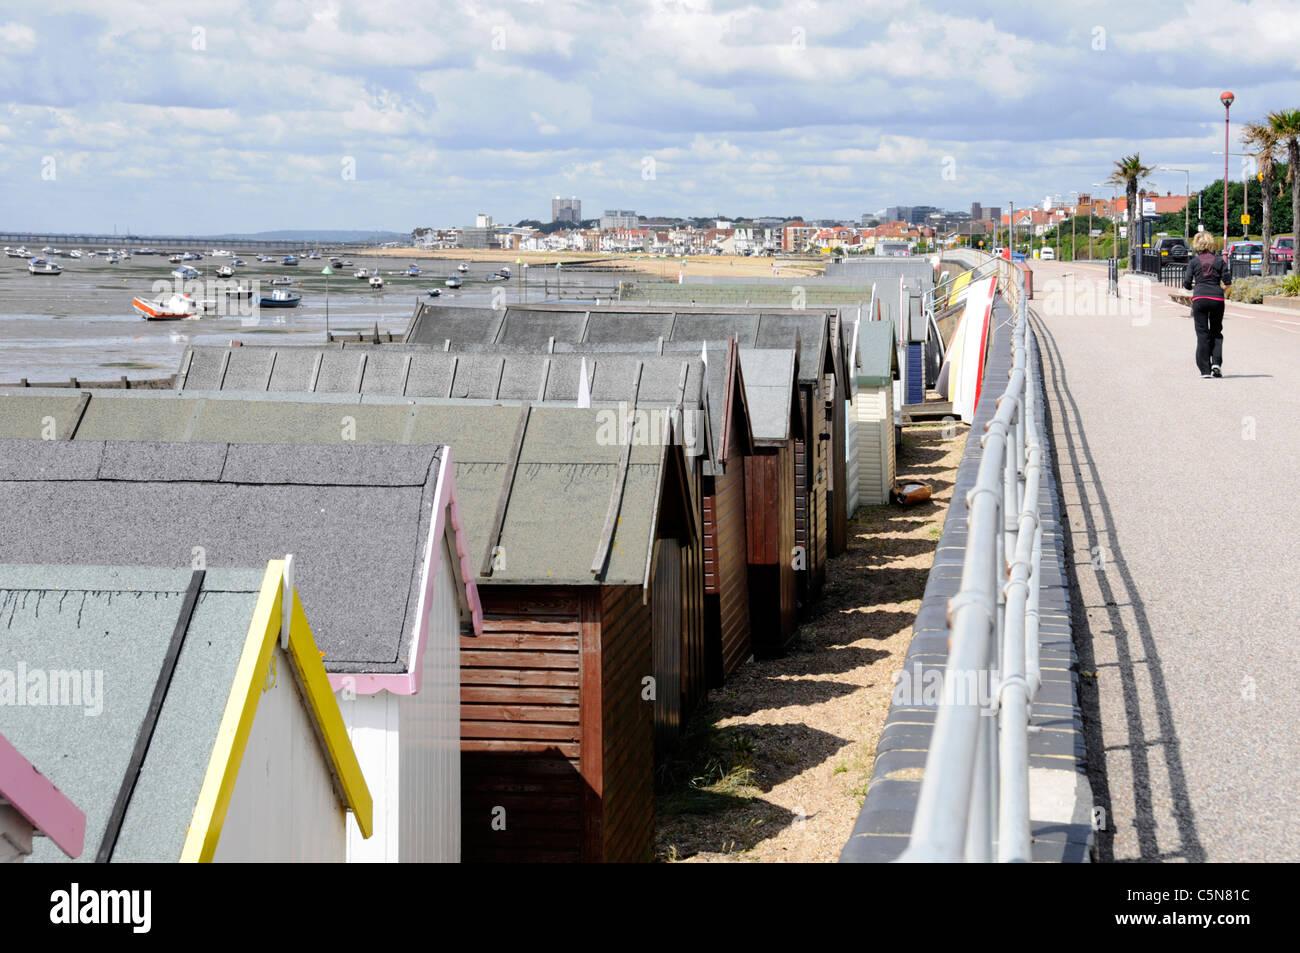 Seafront Beach Huts on sandy beach at Shoeburyness promenade & views towards Southend on Sea seaside resort - Stock Image